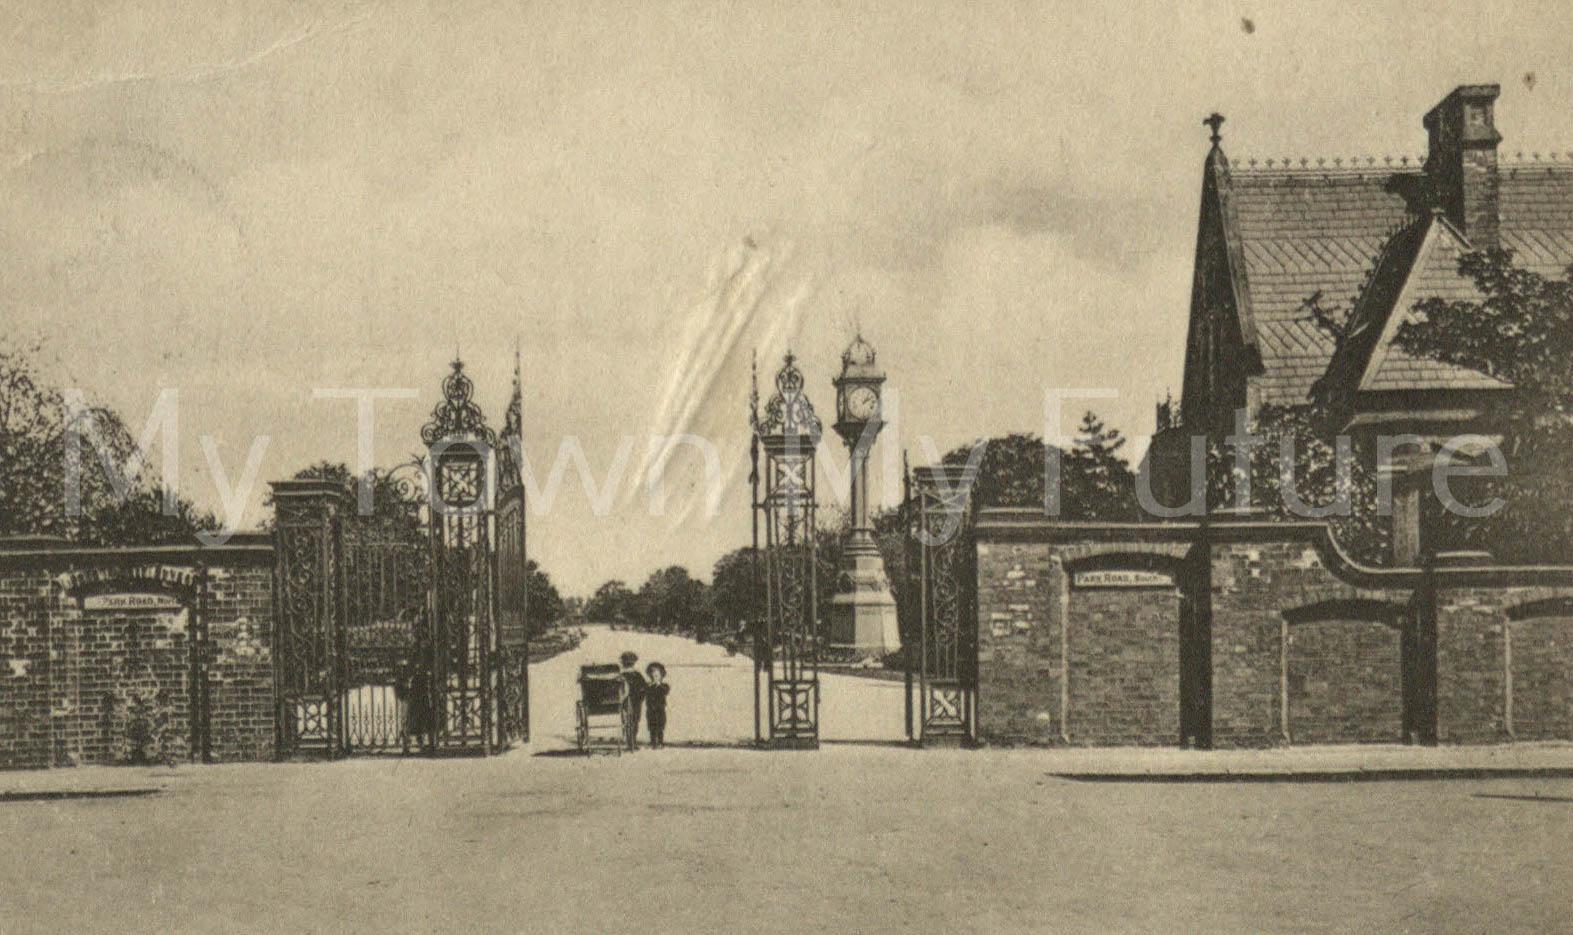 Albert Park - Postcard - Park Gates - to Miss ER Smith, Valentine Series - Dundee